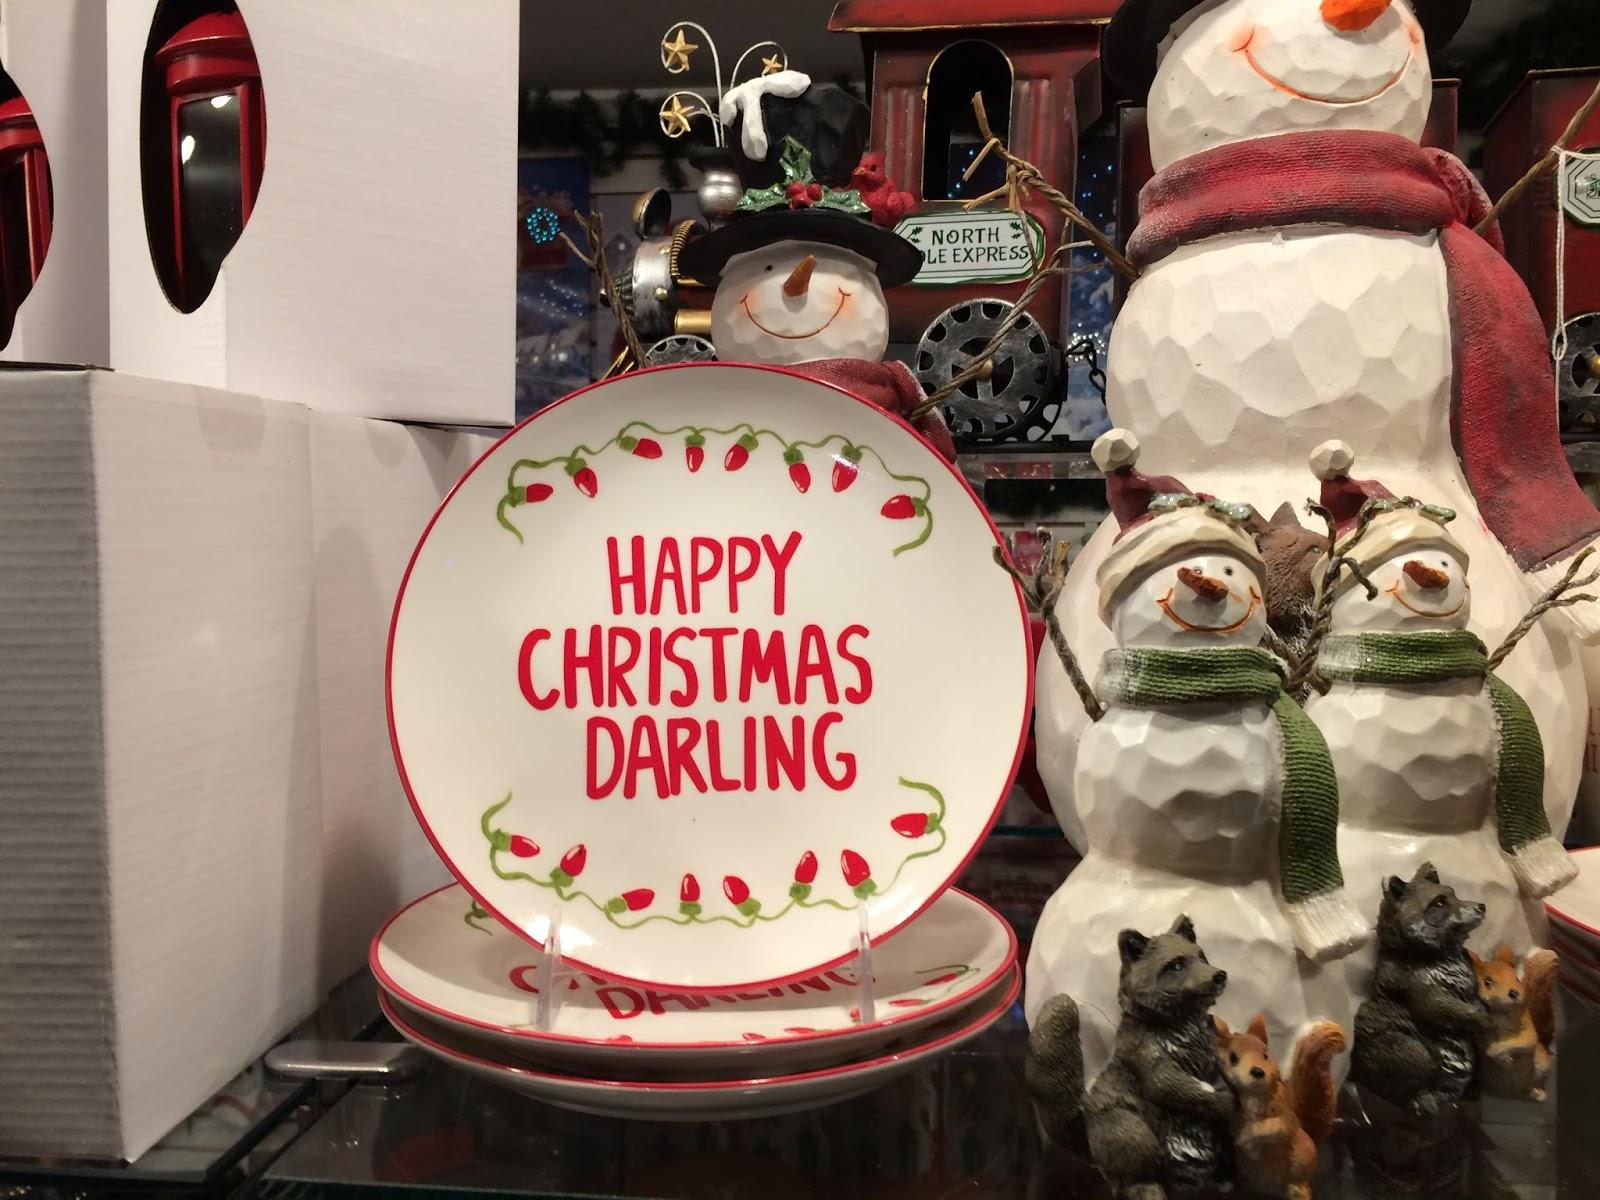 merry christmas darling